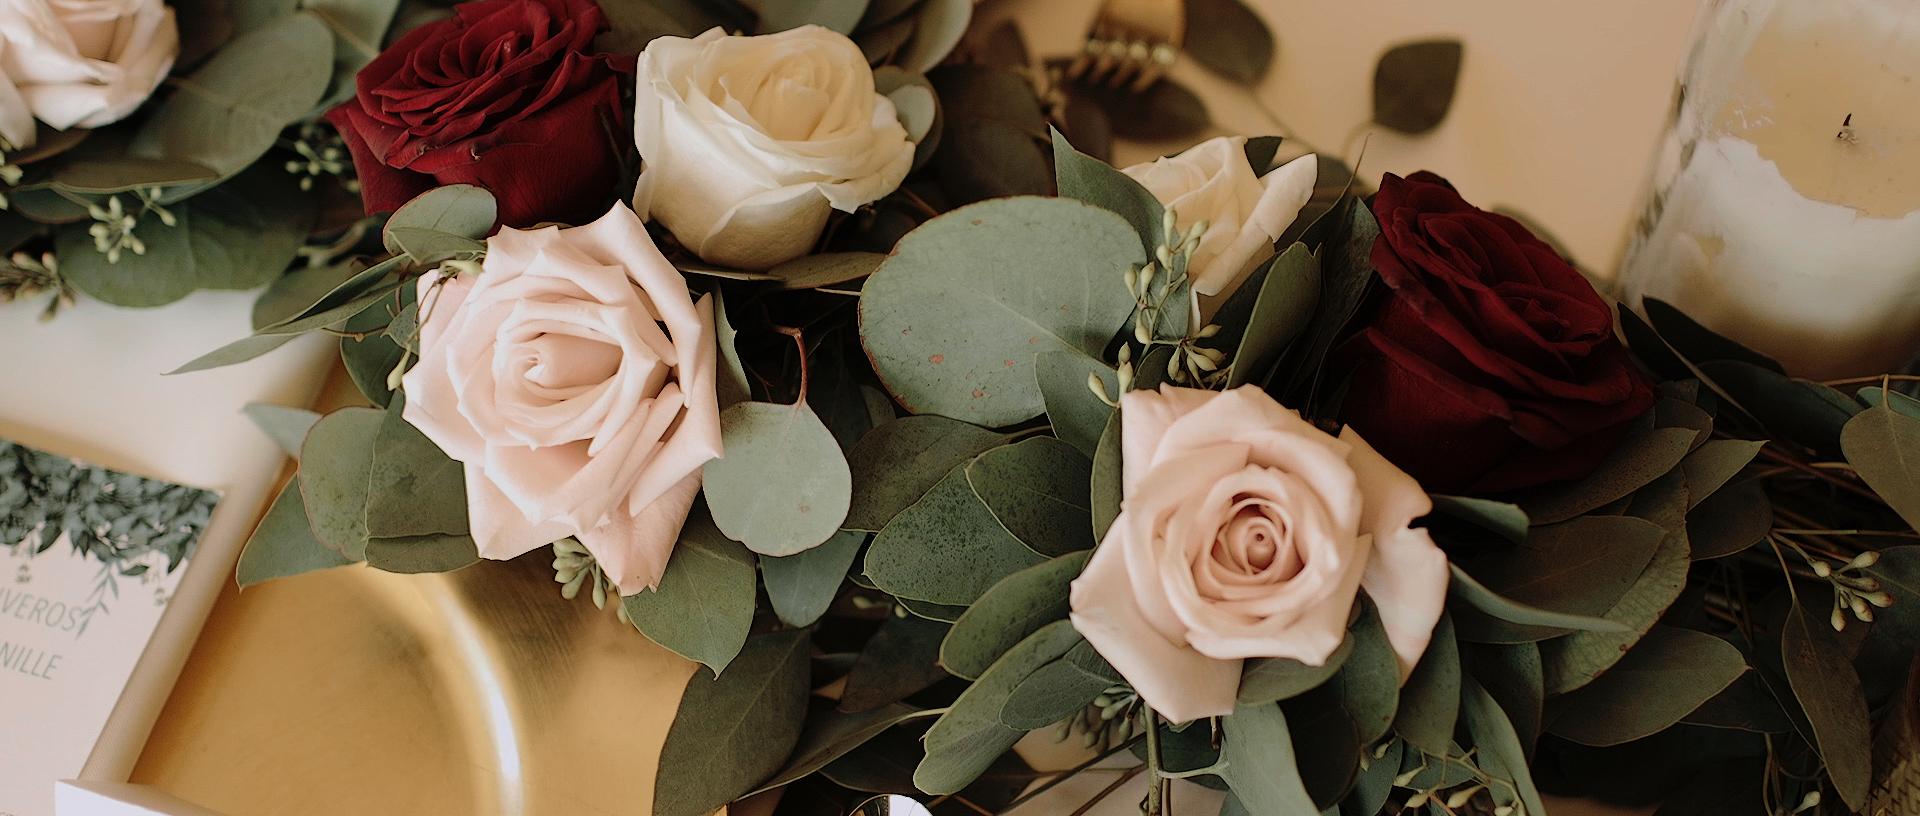 wedding-flowers-wichita-kansas